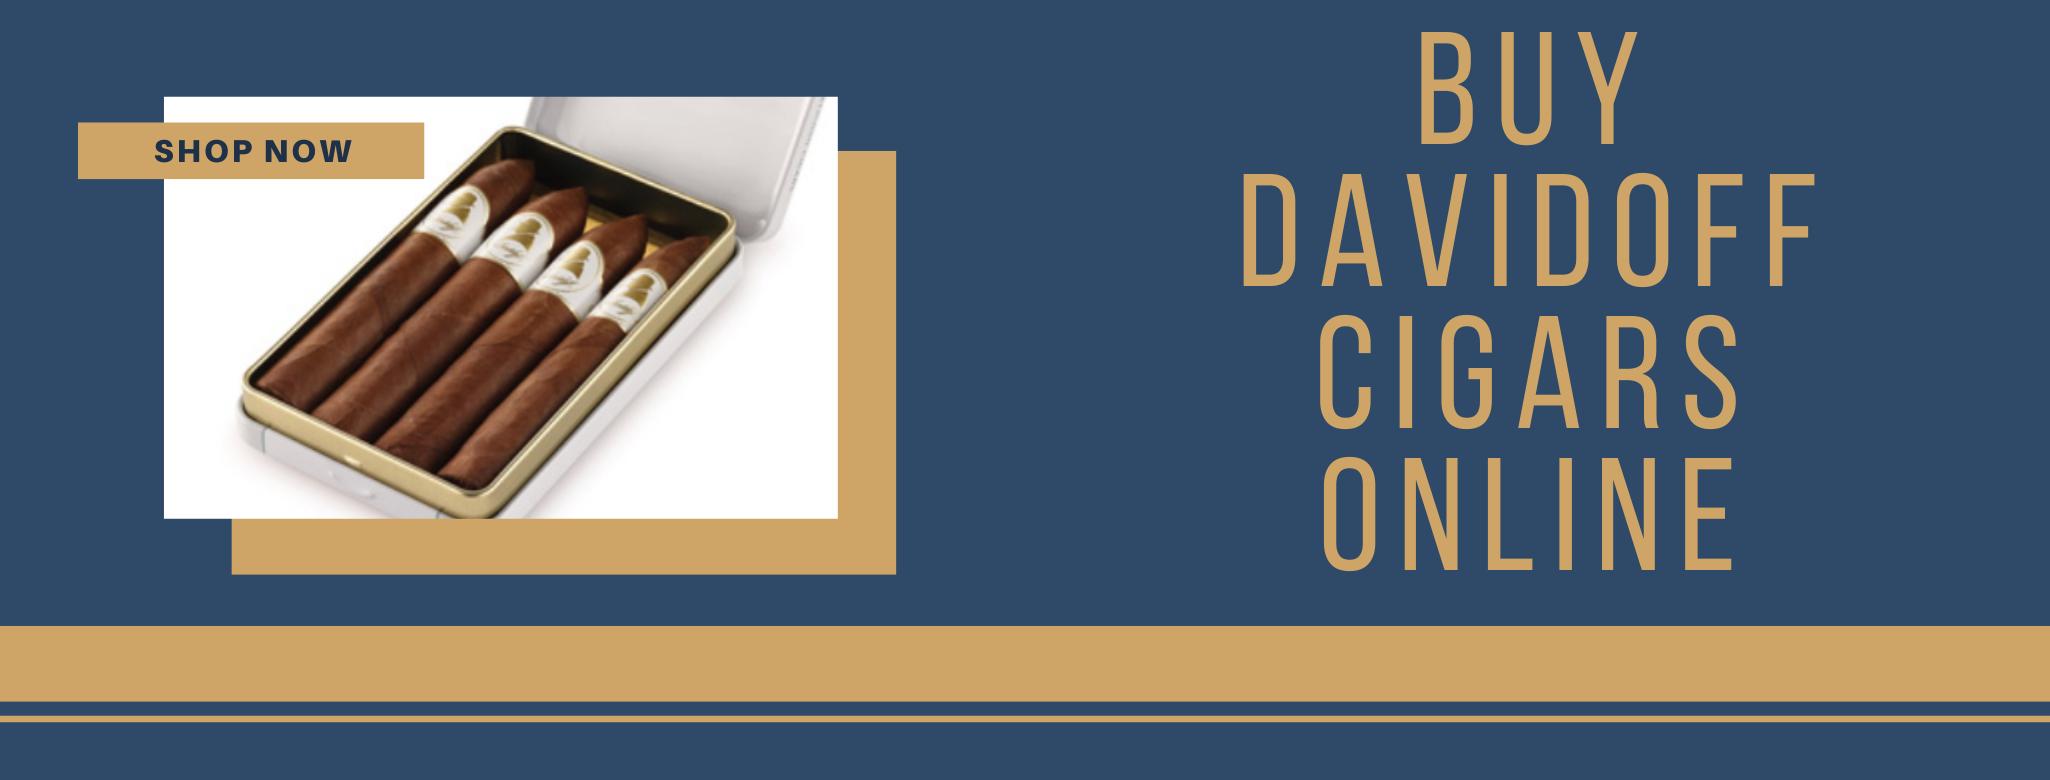 buy Davidoff cigars online